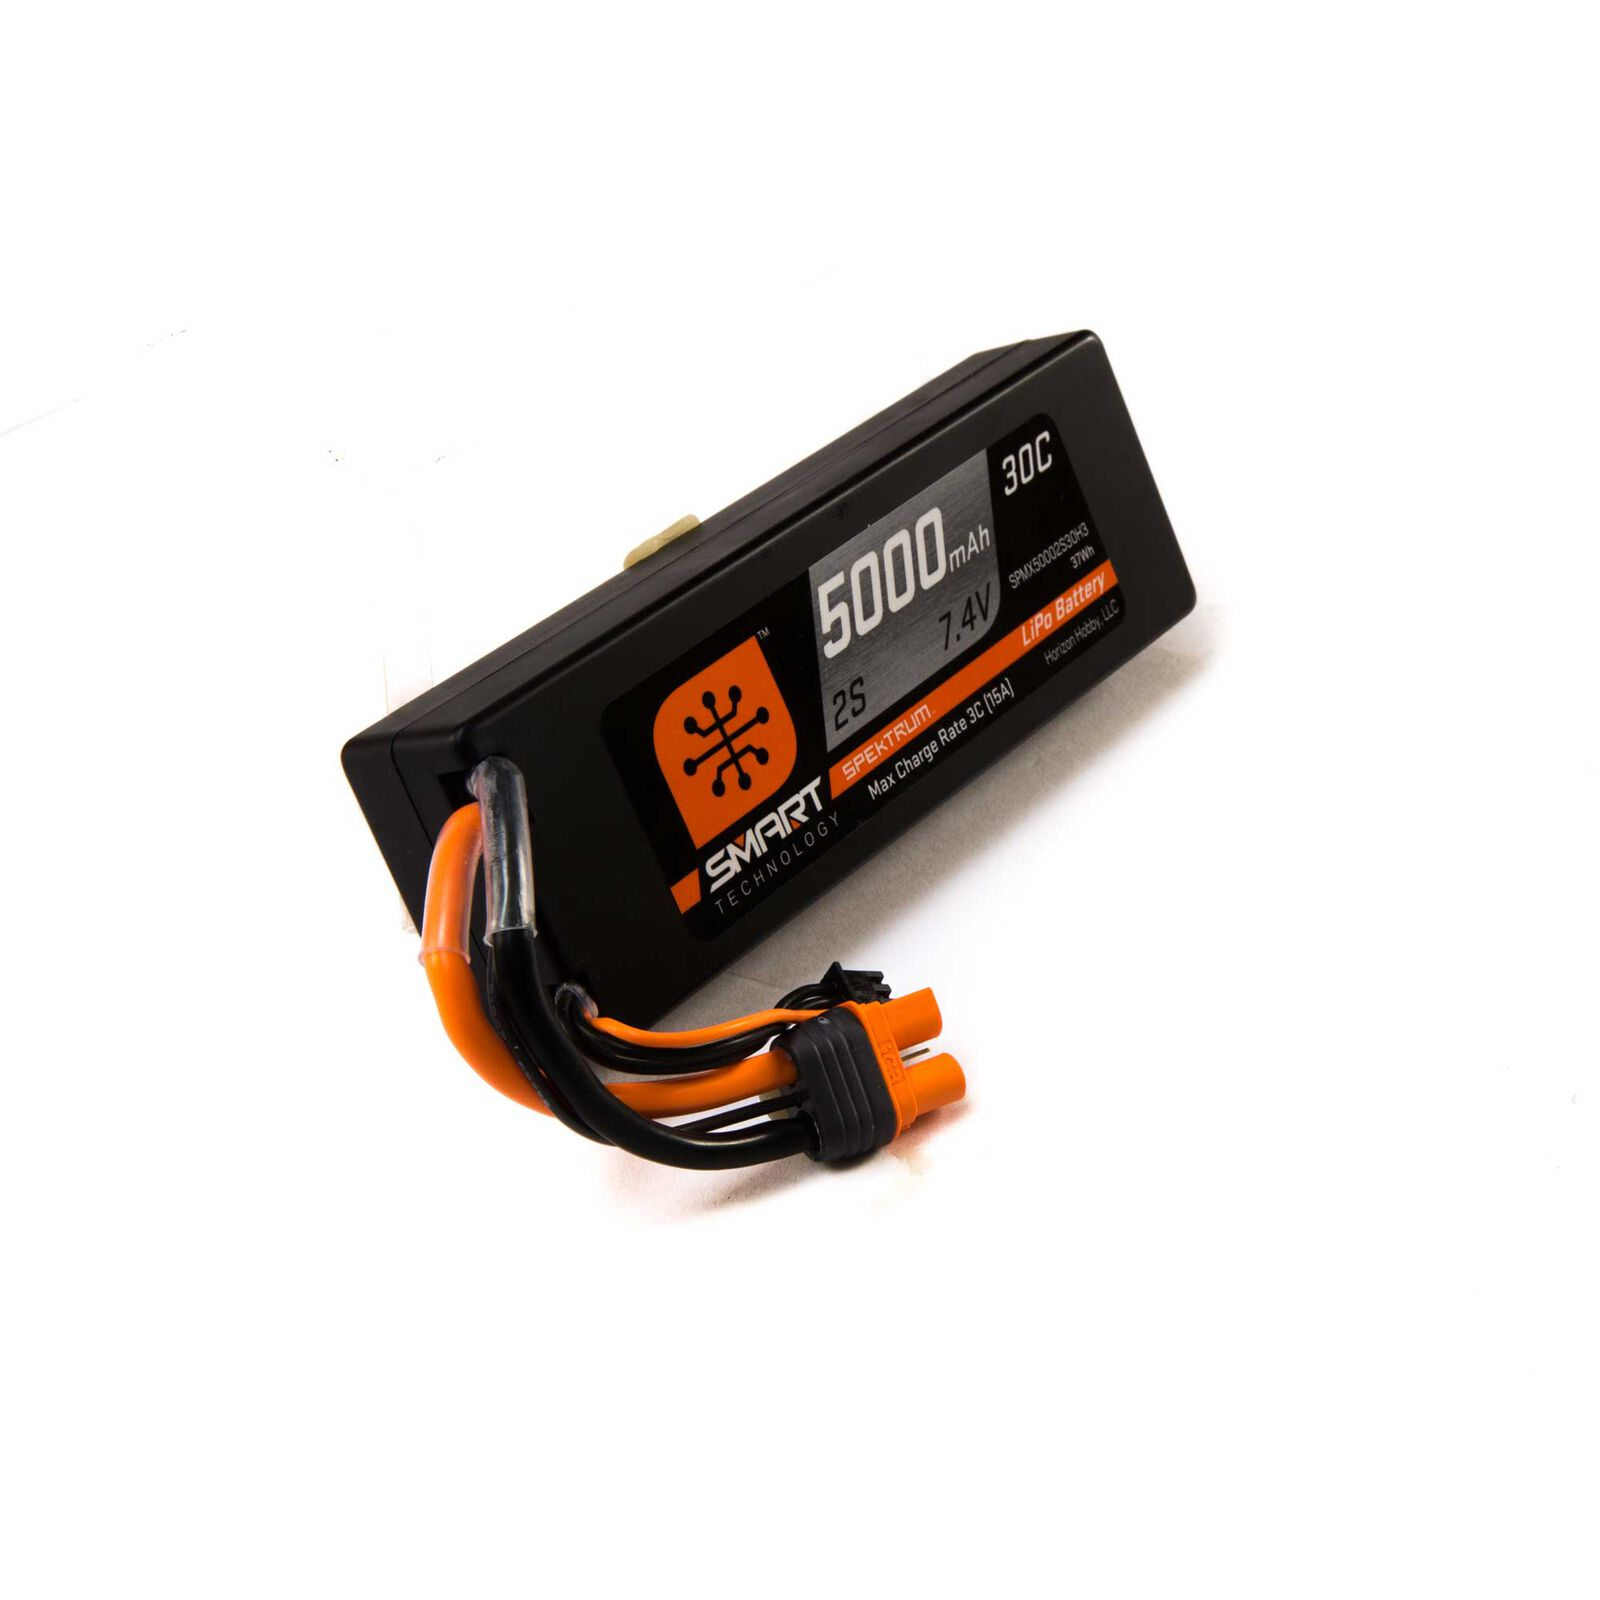 7.4V 5000mAh 2S 30C Smart LiPo Hardcase Battery: IC3